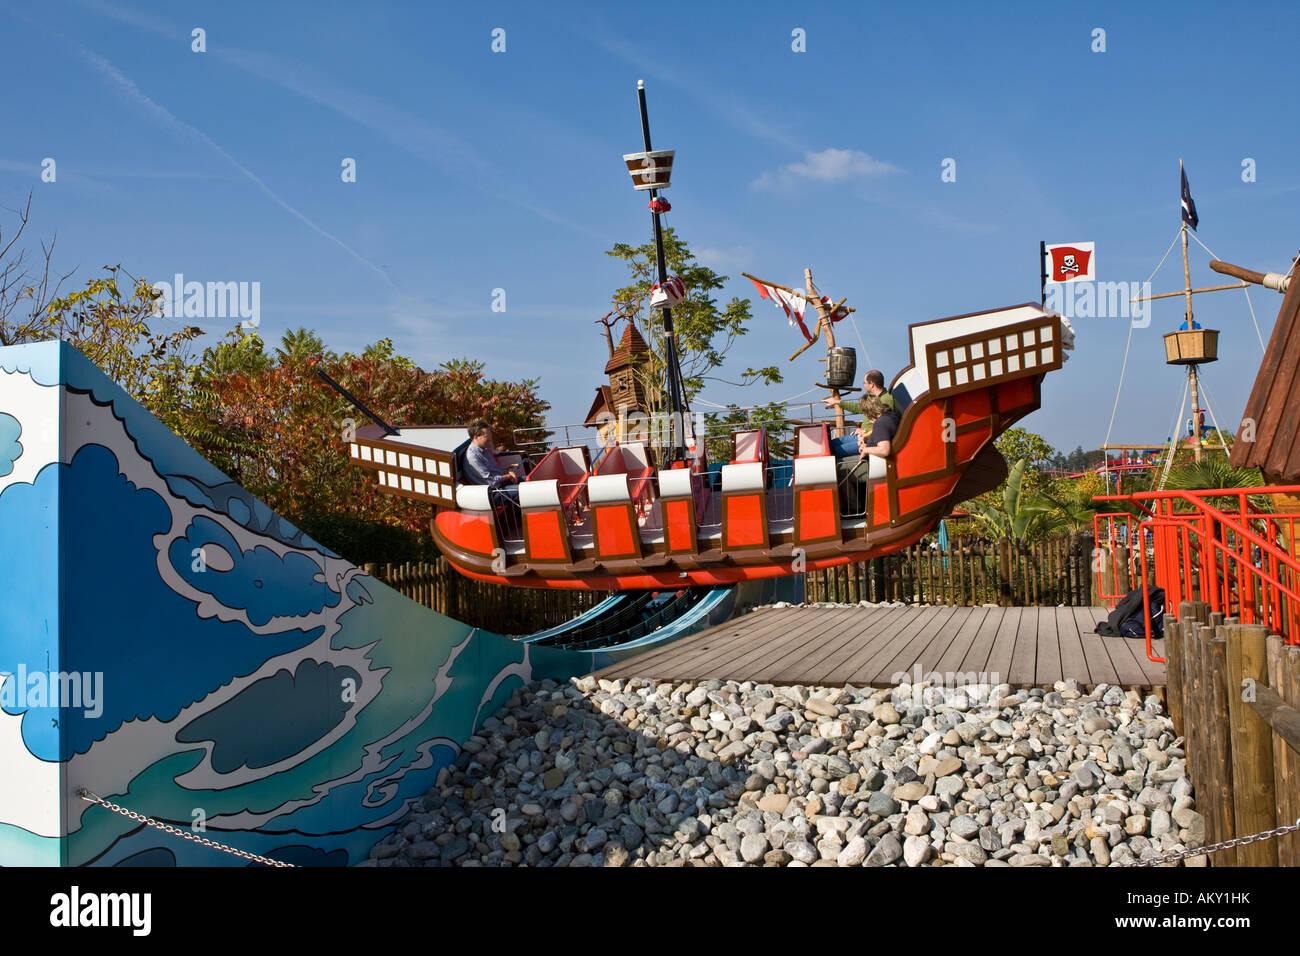 Pirate swing, Legoland...